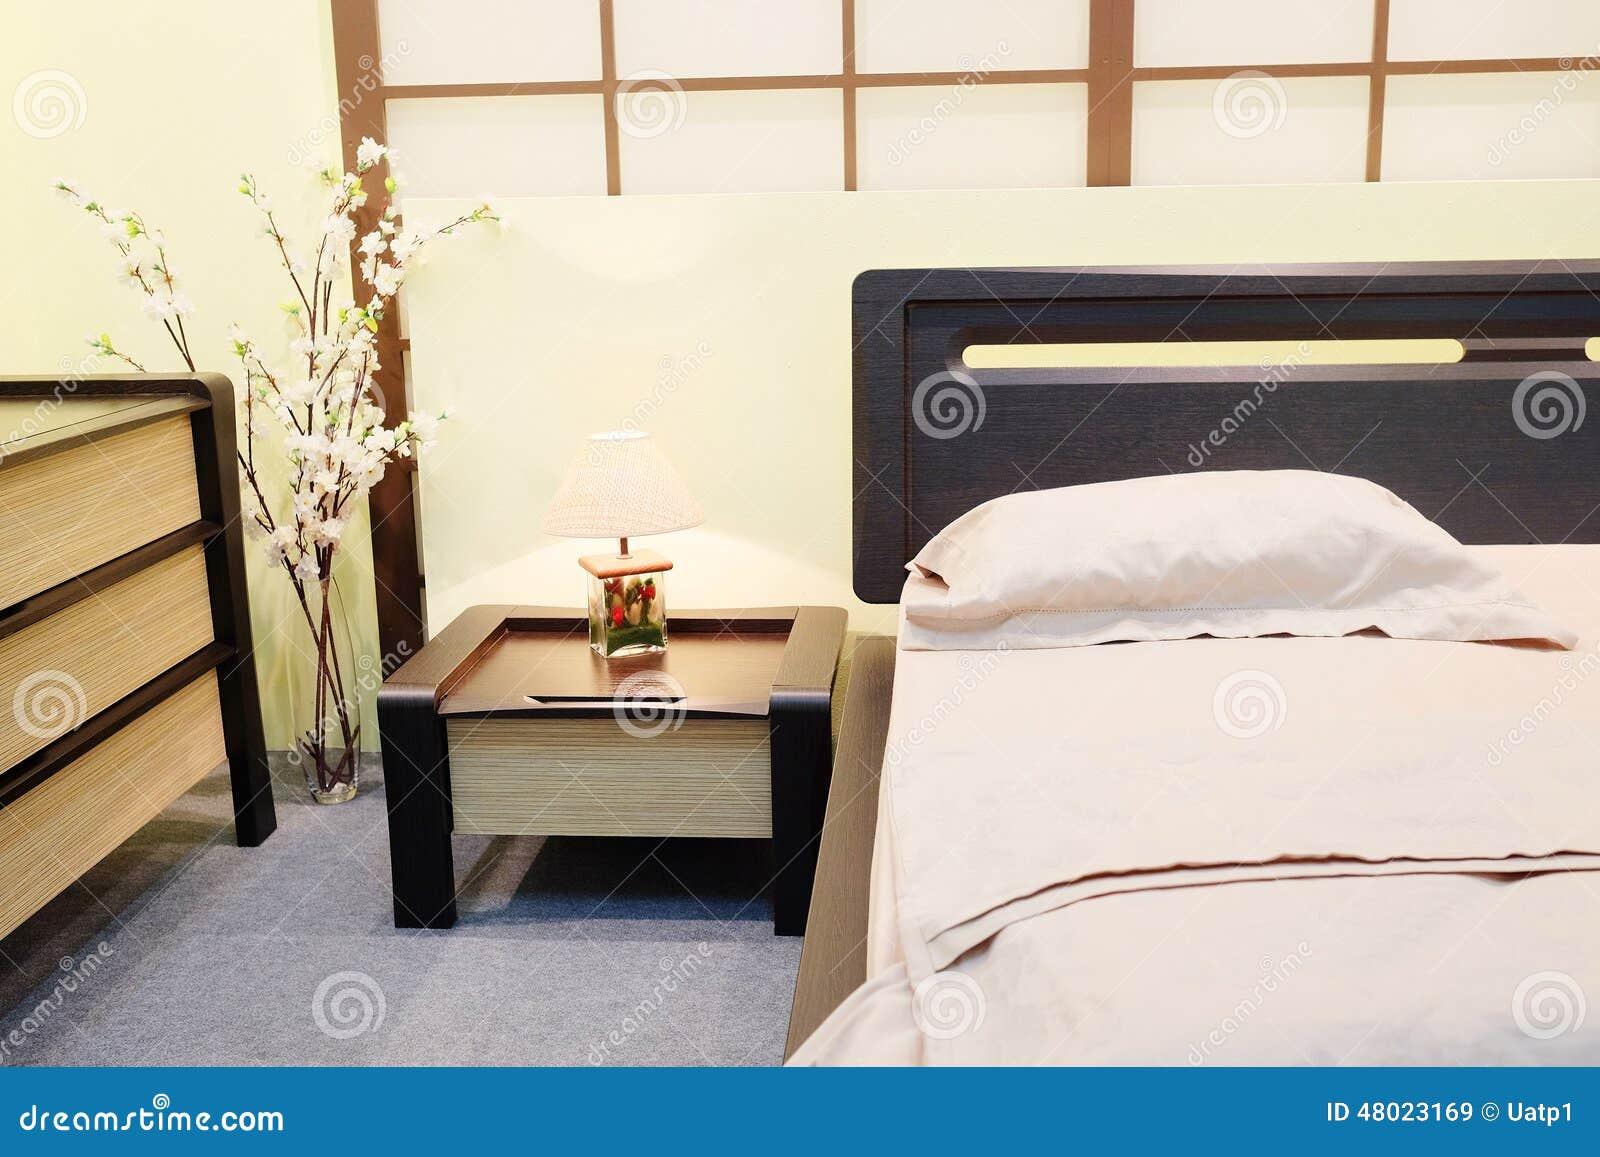 Slaapkamer japanse stijl - Slaapkamer stijl ...